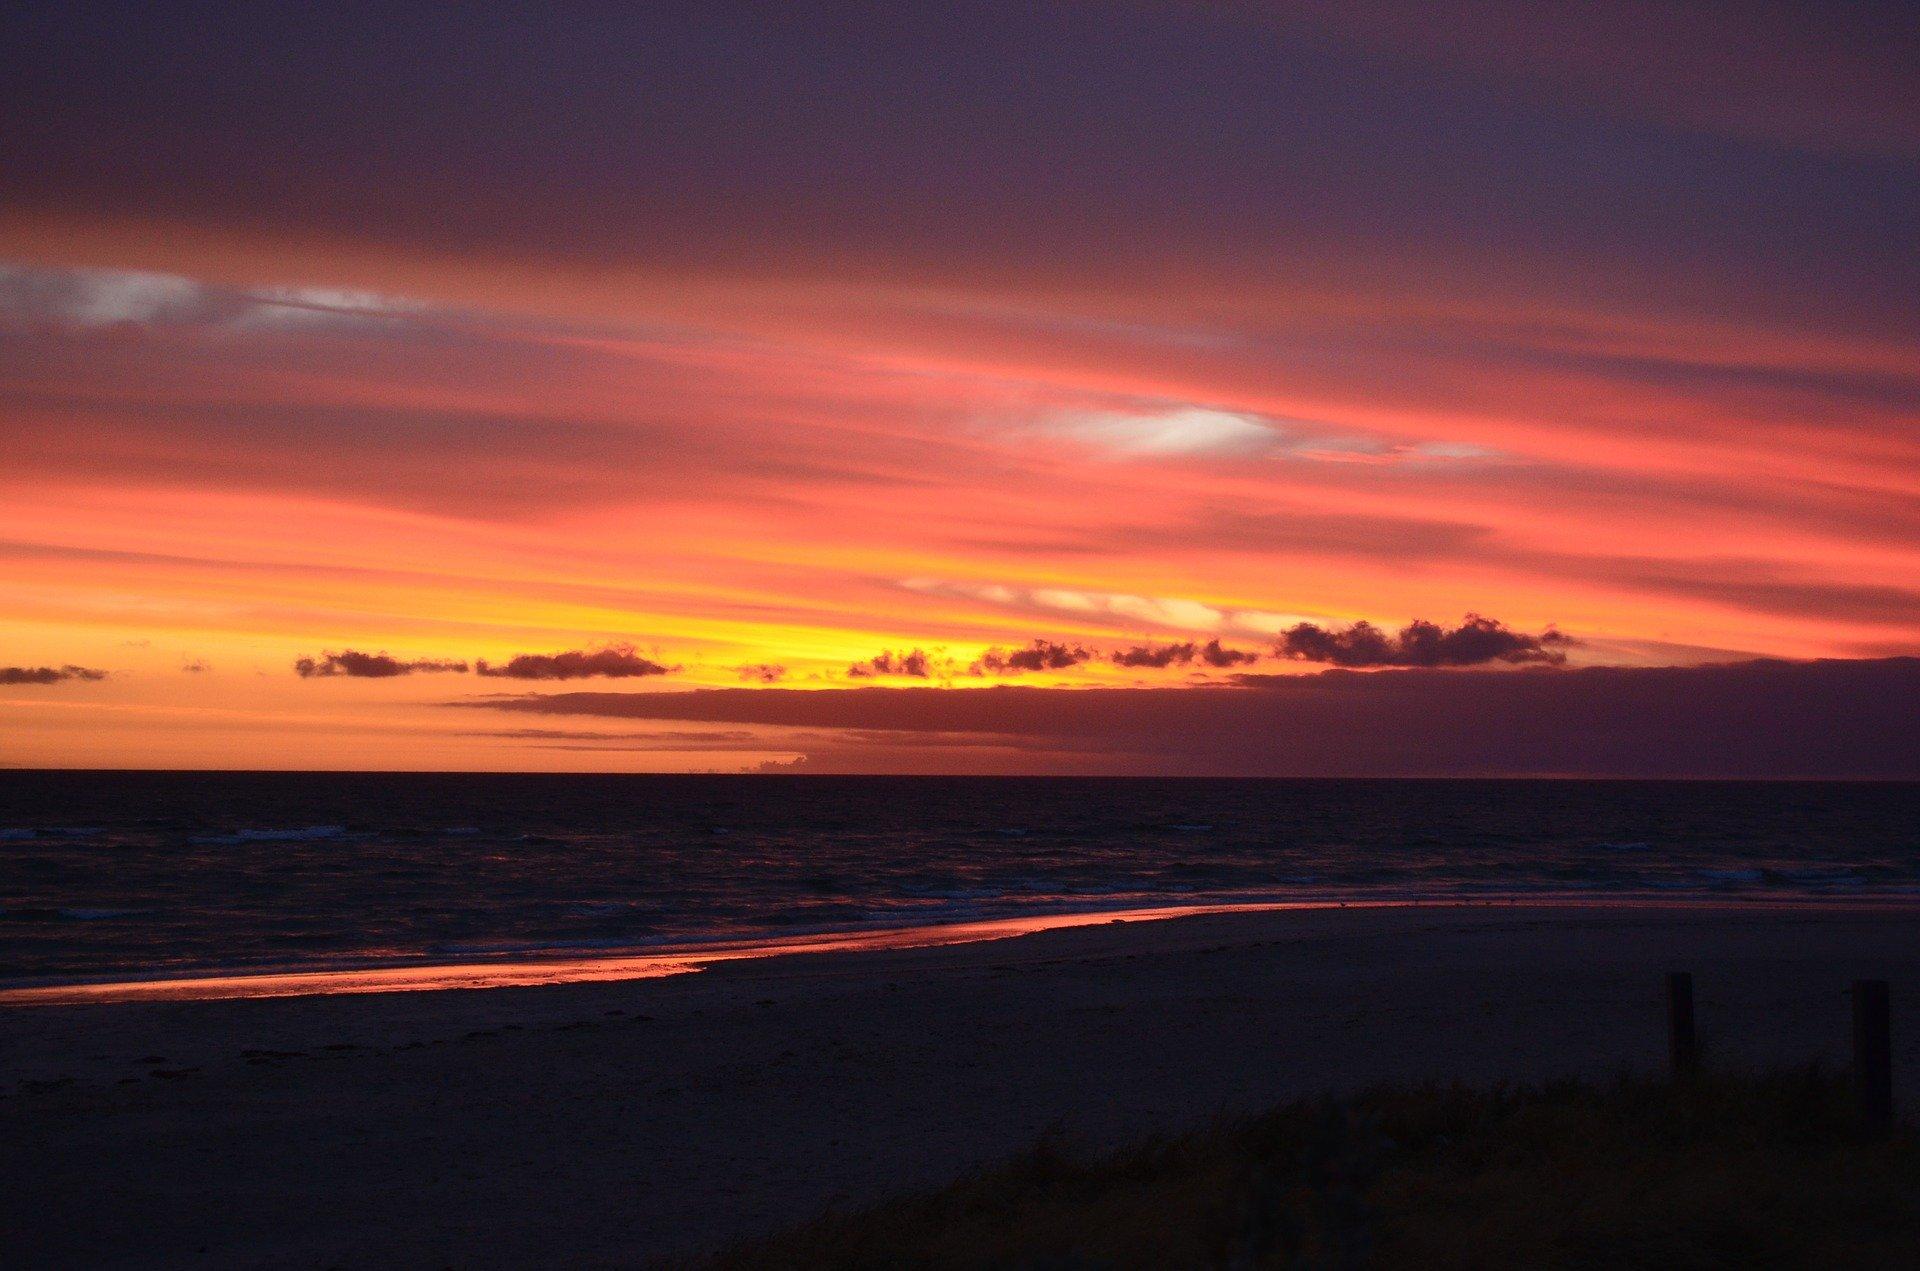 sunset-358954_1920